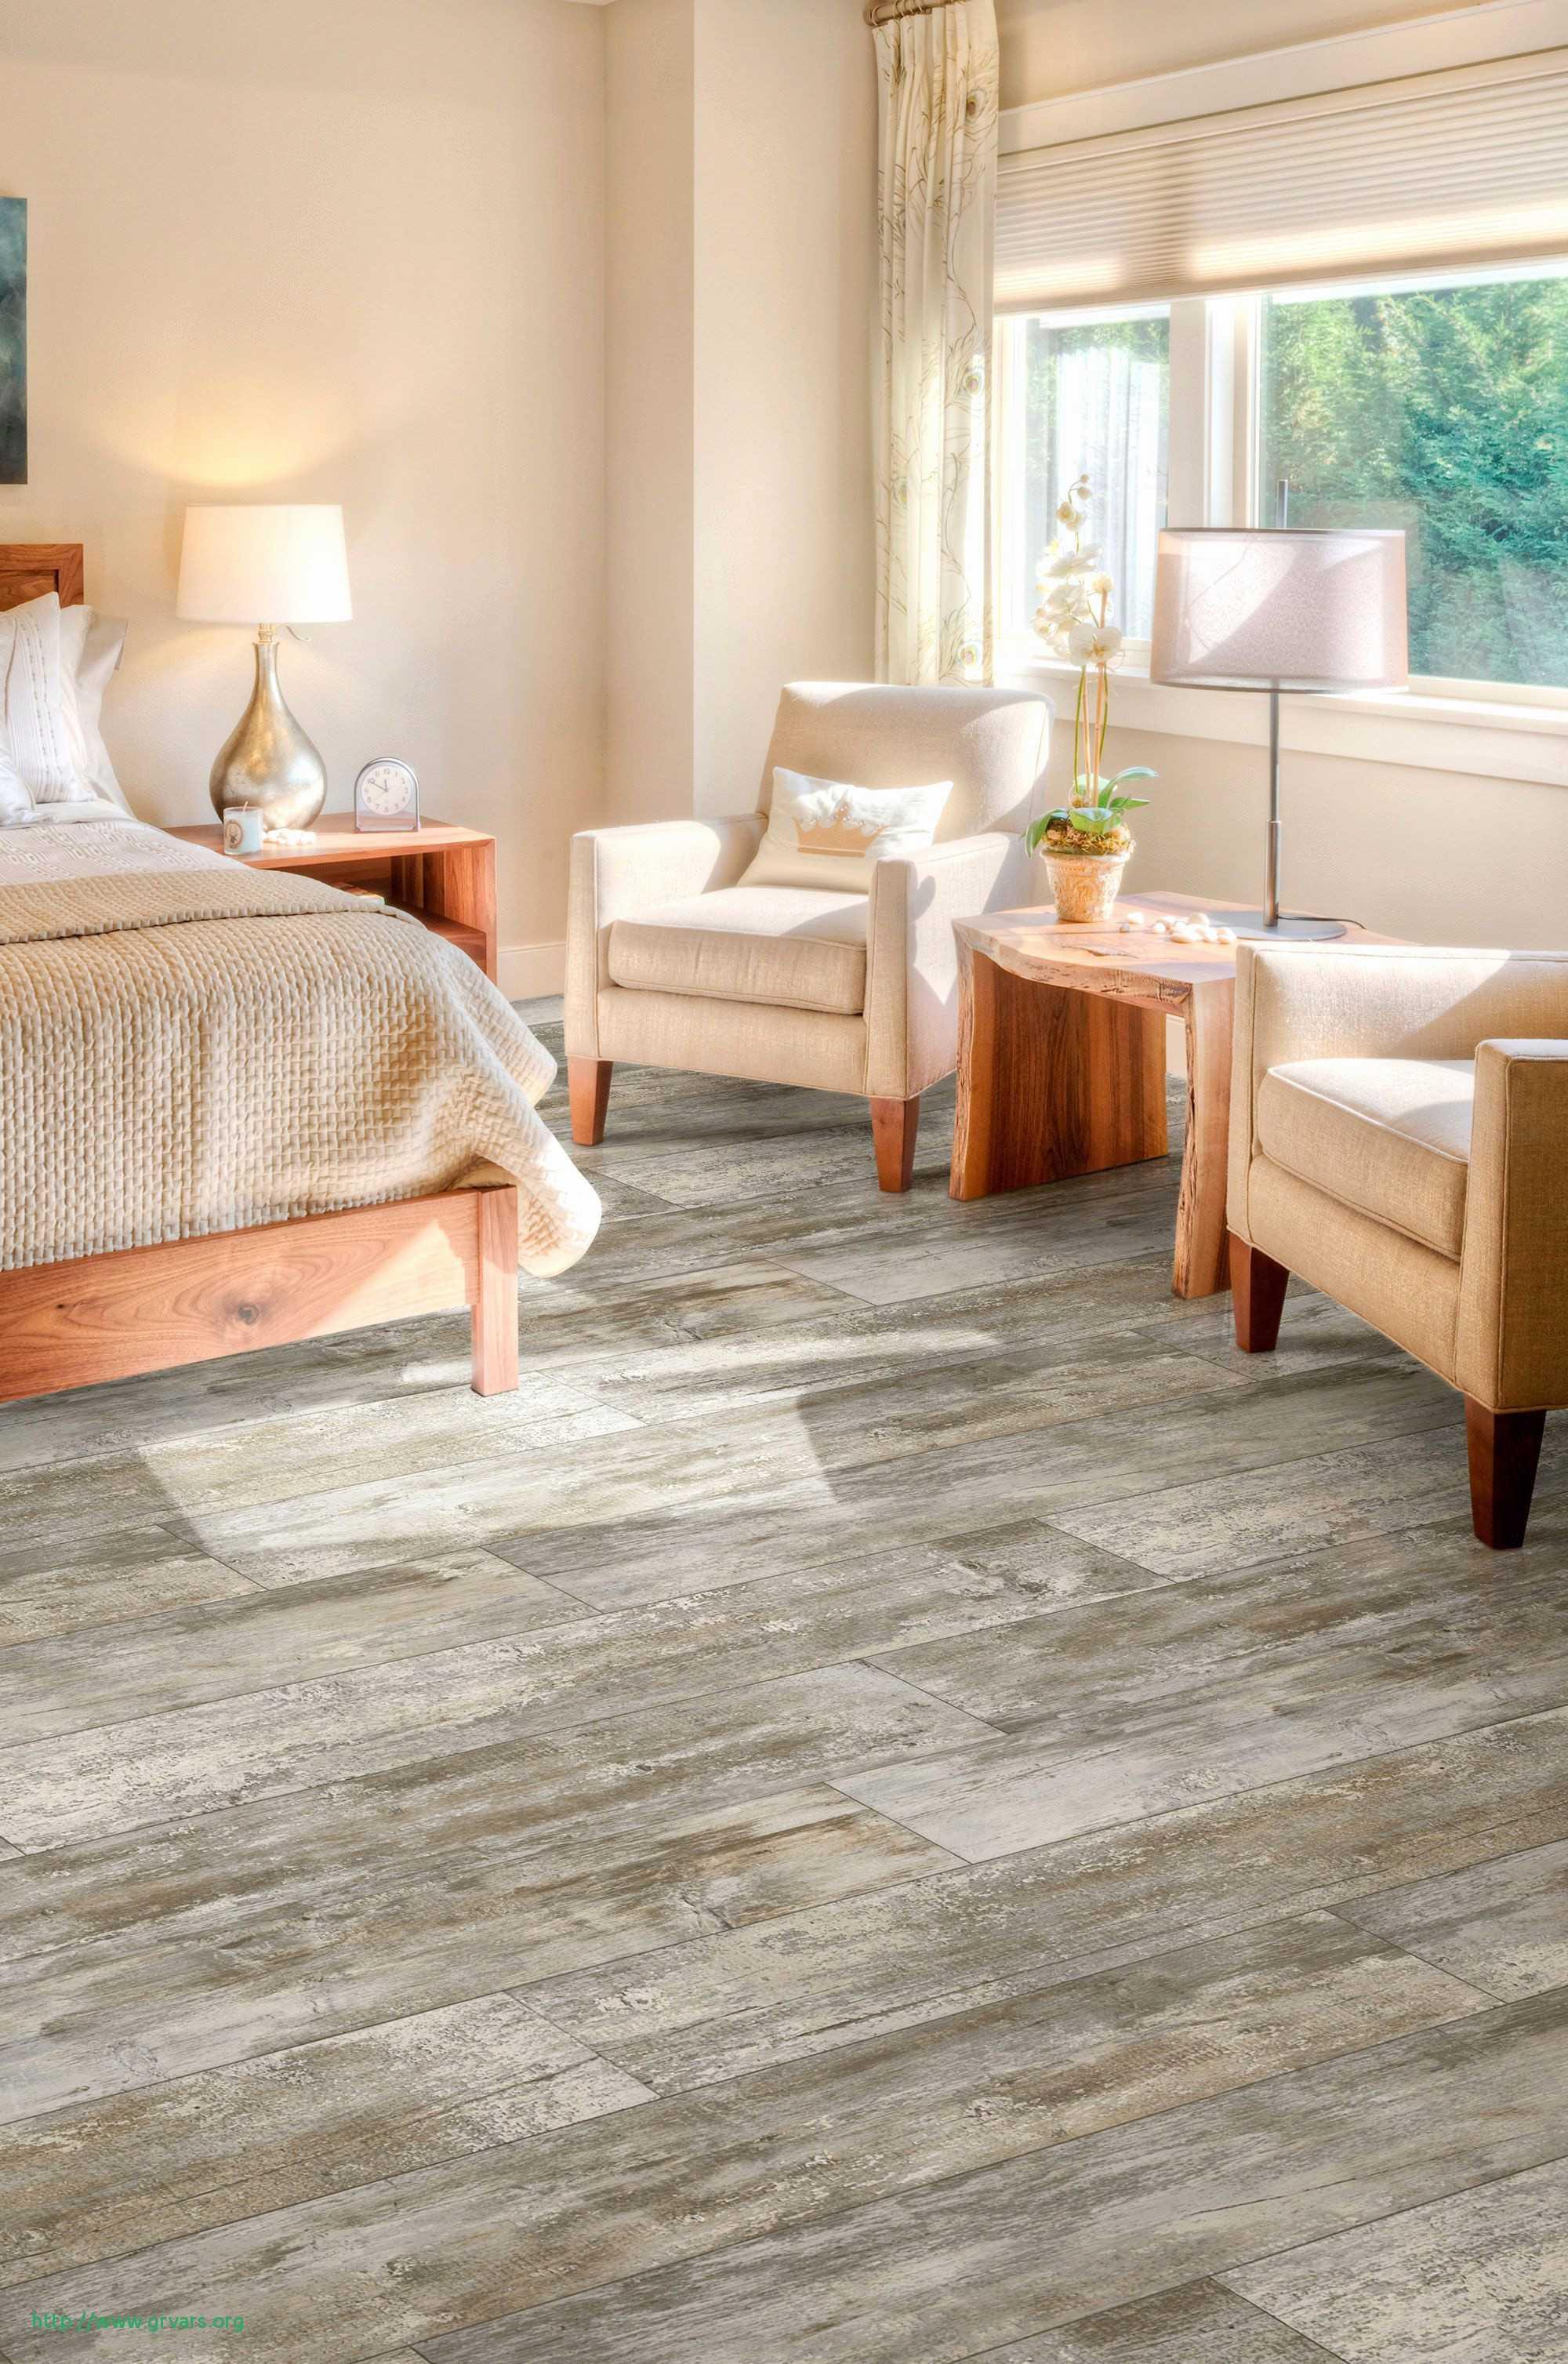 hardwood flooring houston tx of 23 frais how much is a hardwood floor ideas blog inside hardwood floor wood hardwood floor types unique i pinimg 736x 0d 7b 00 luxury wood